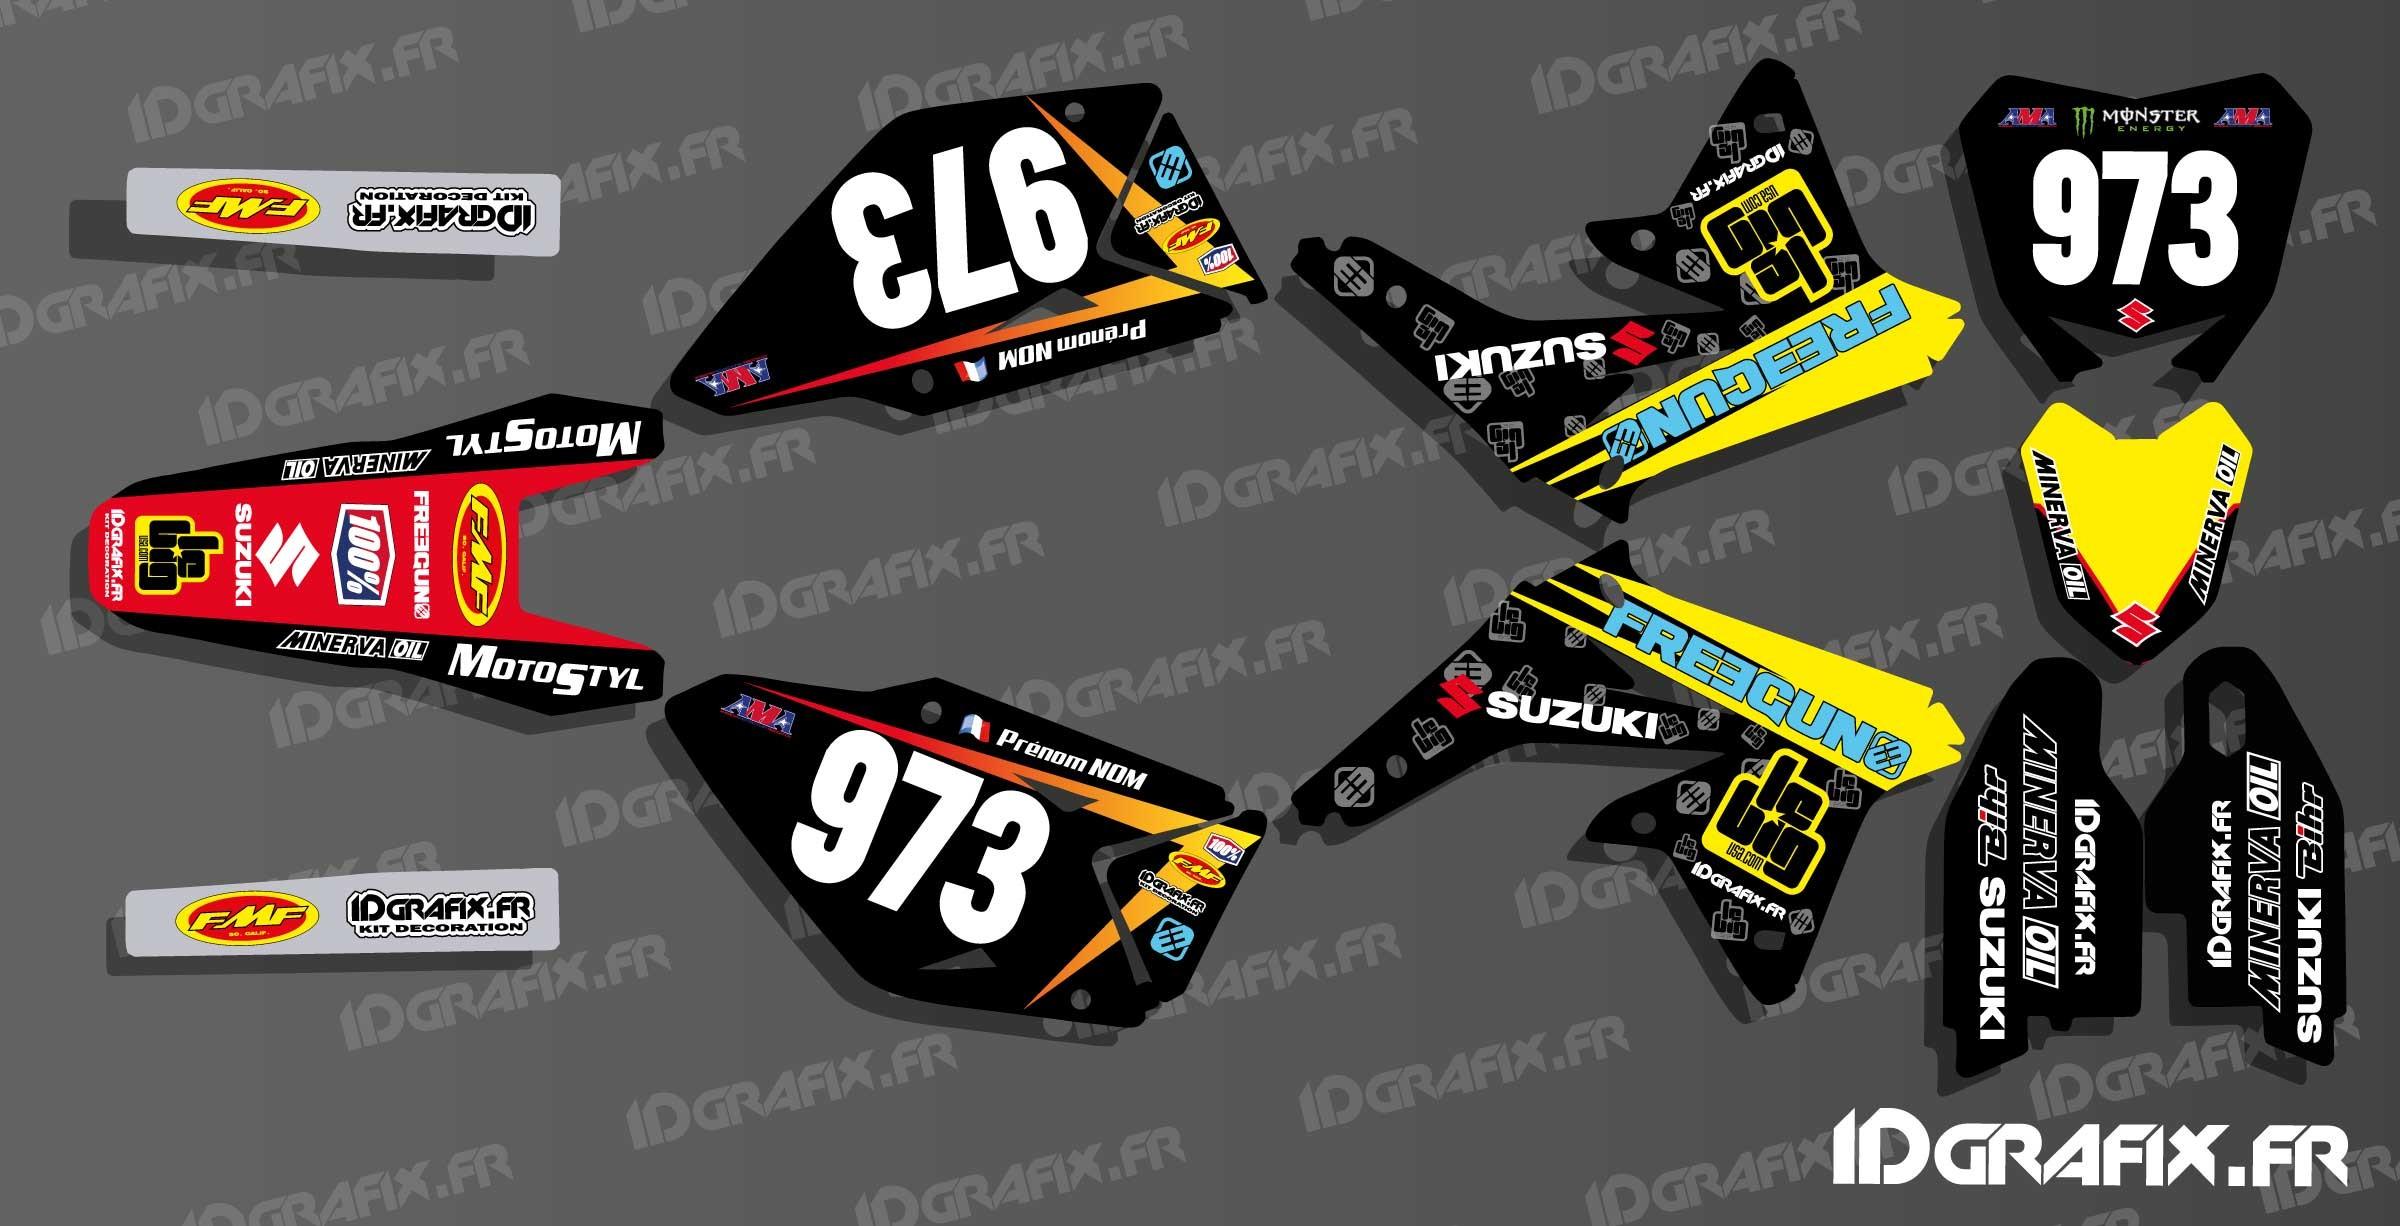 kit deco us freegun series for suzuki rm rmz idgrafix